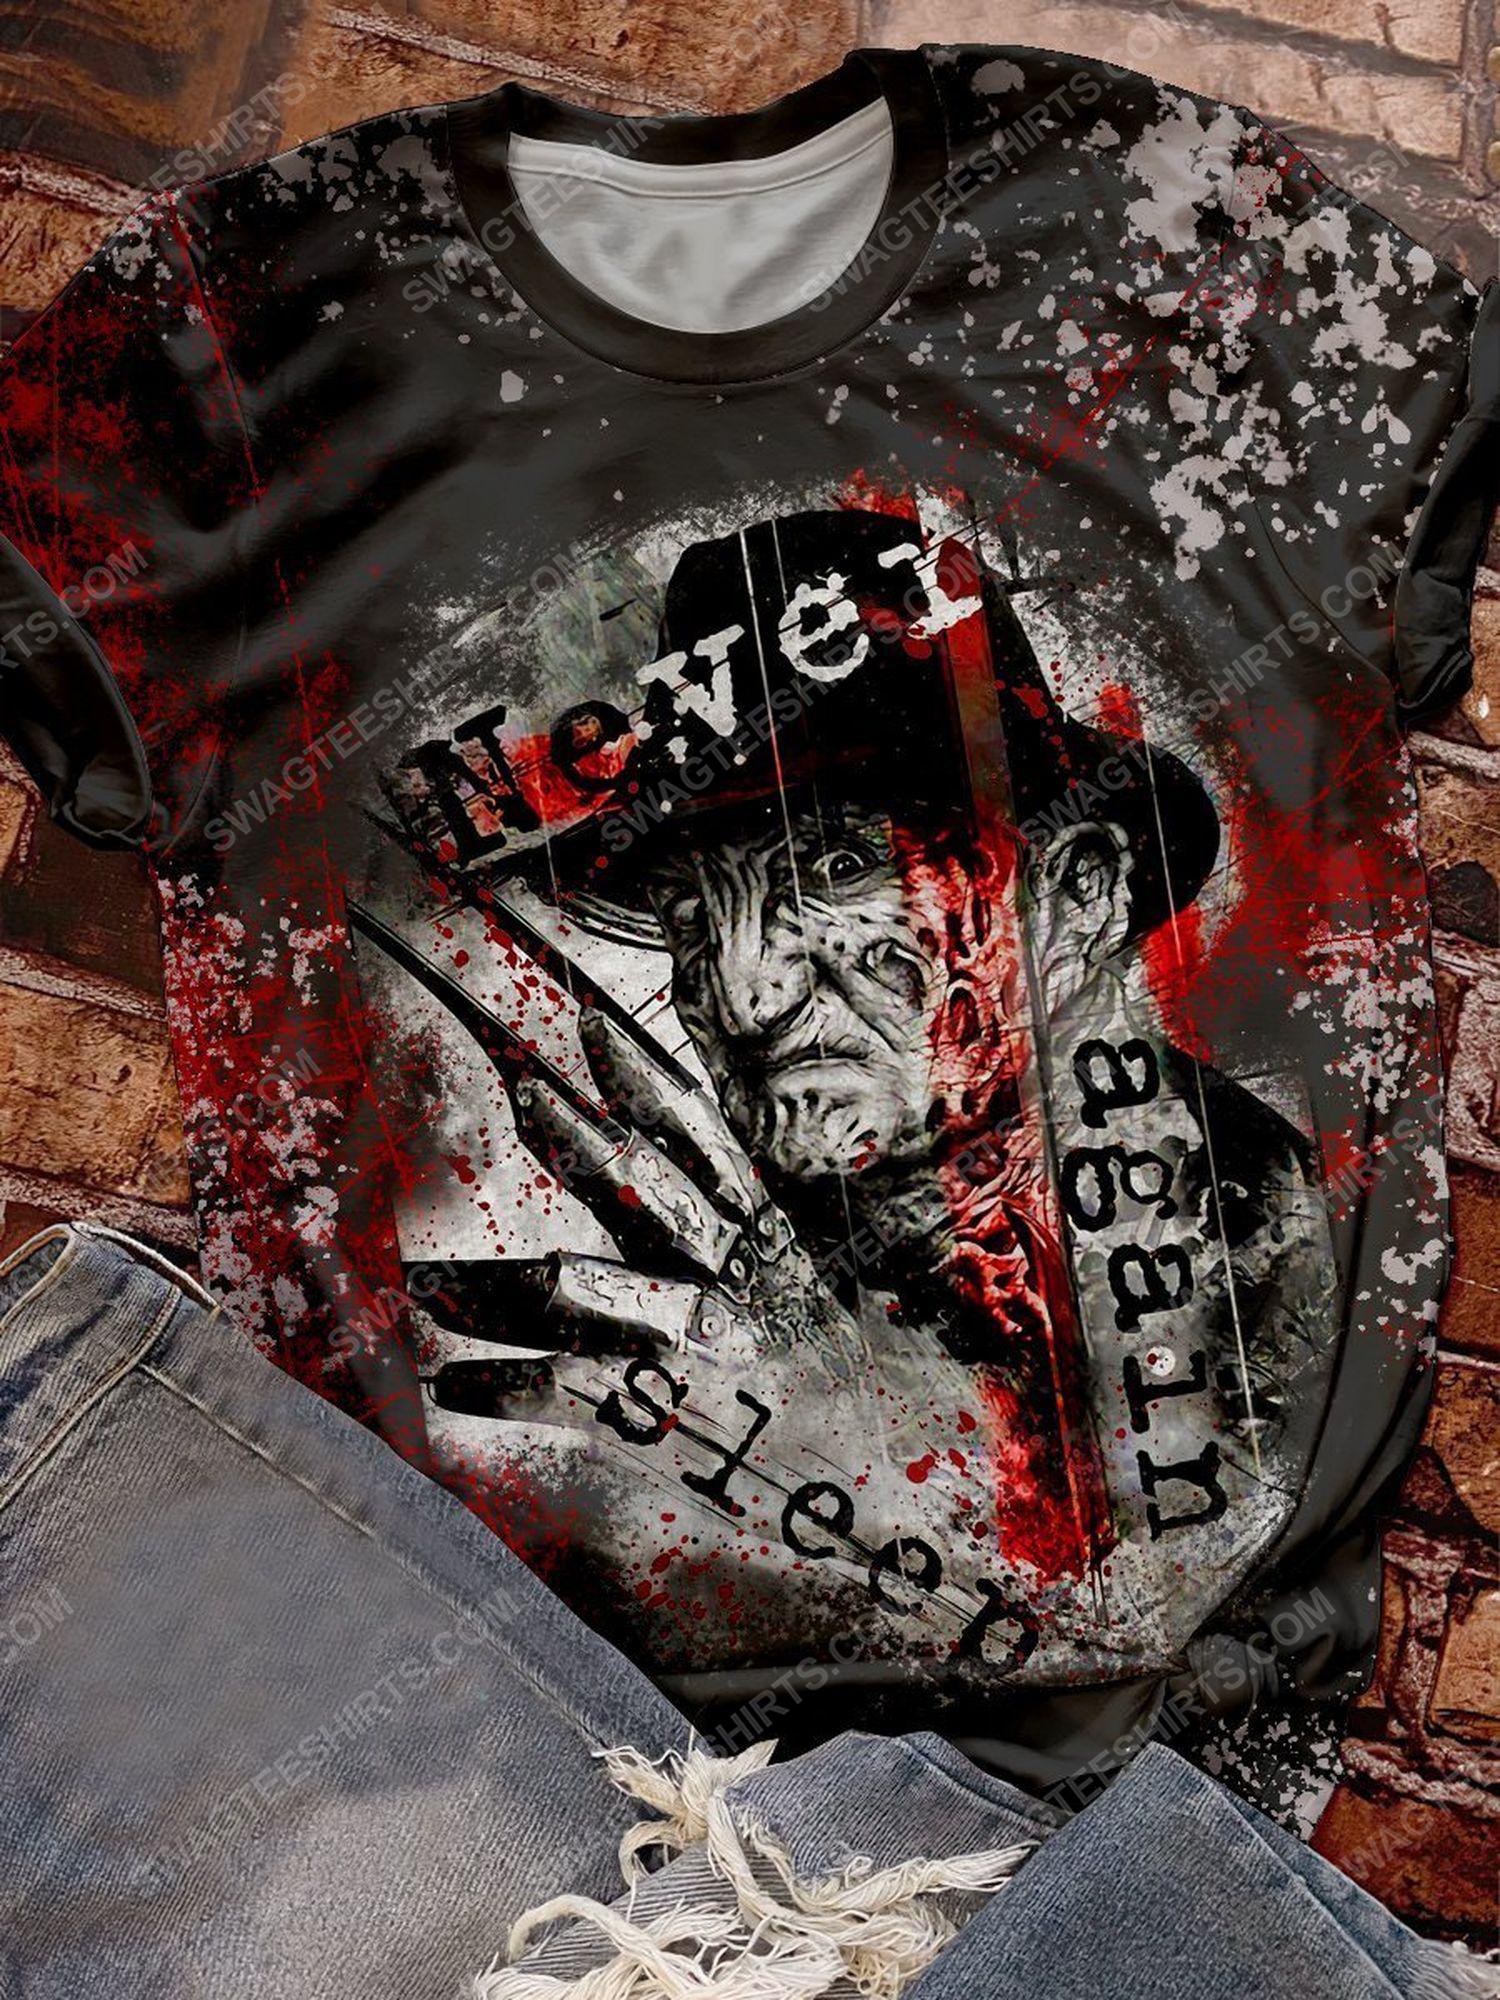 Halloween freddy's nightmares never sleep again shirt 1 - Copy (2)